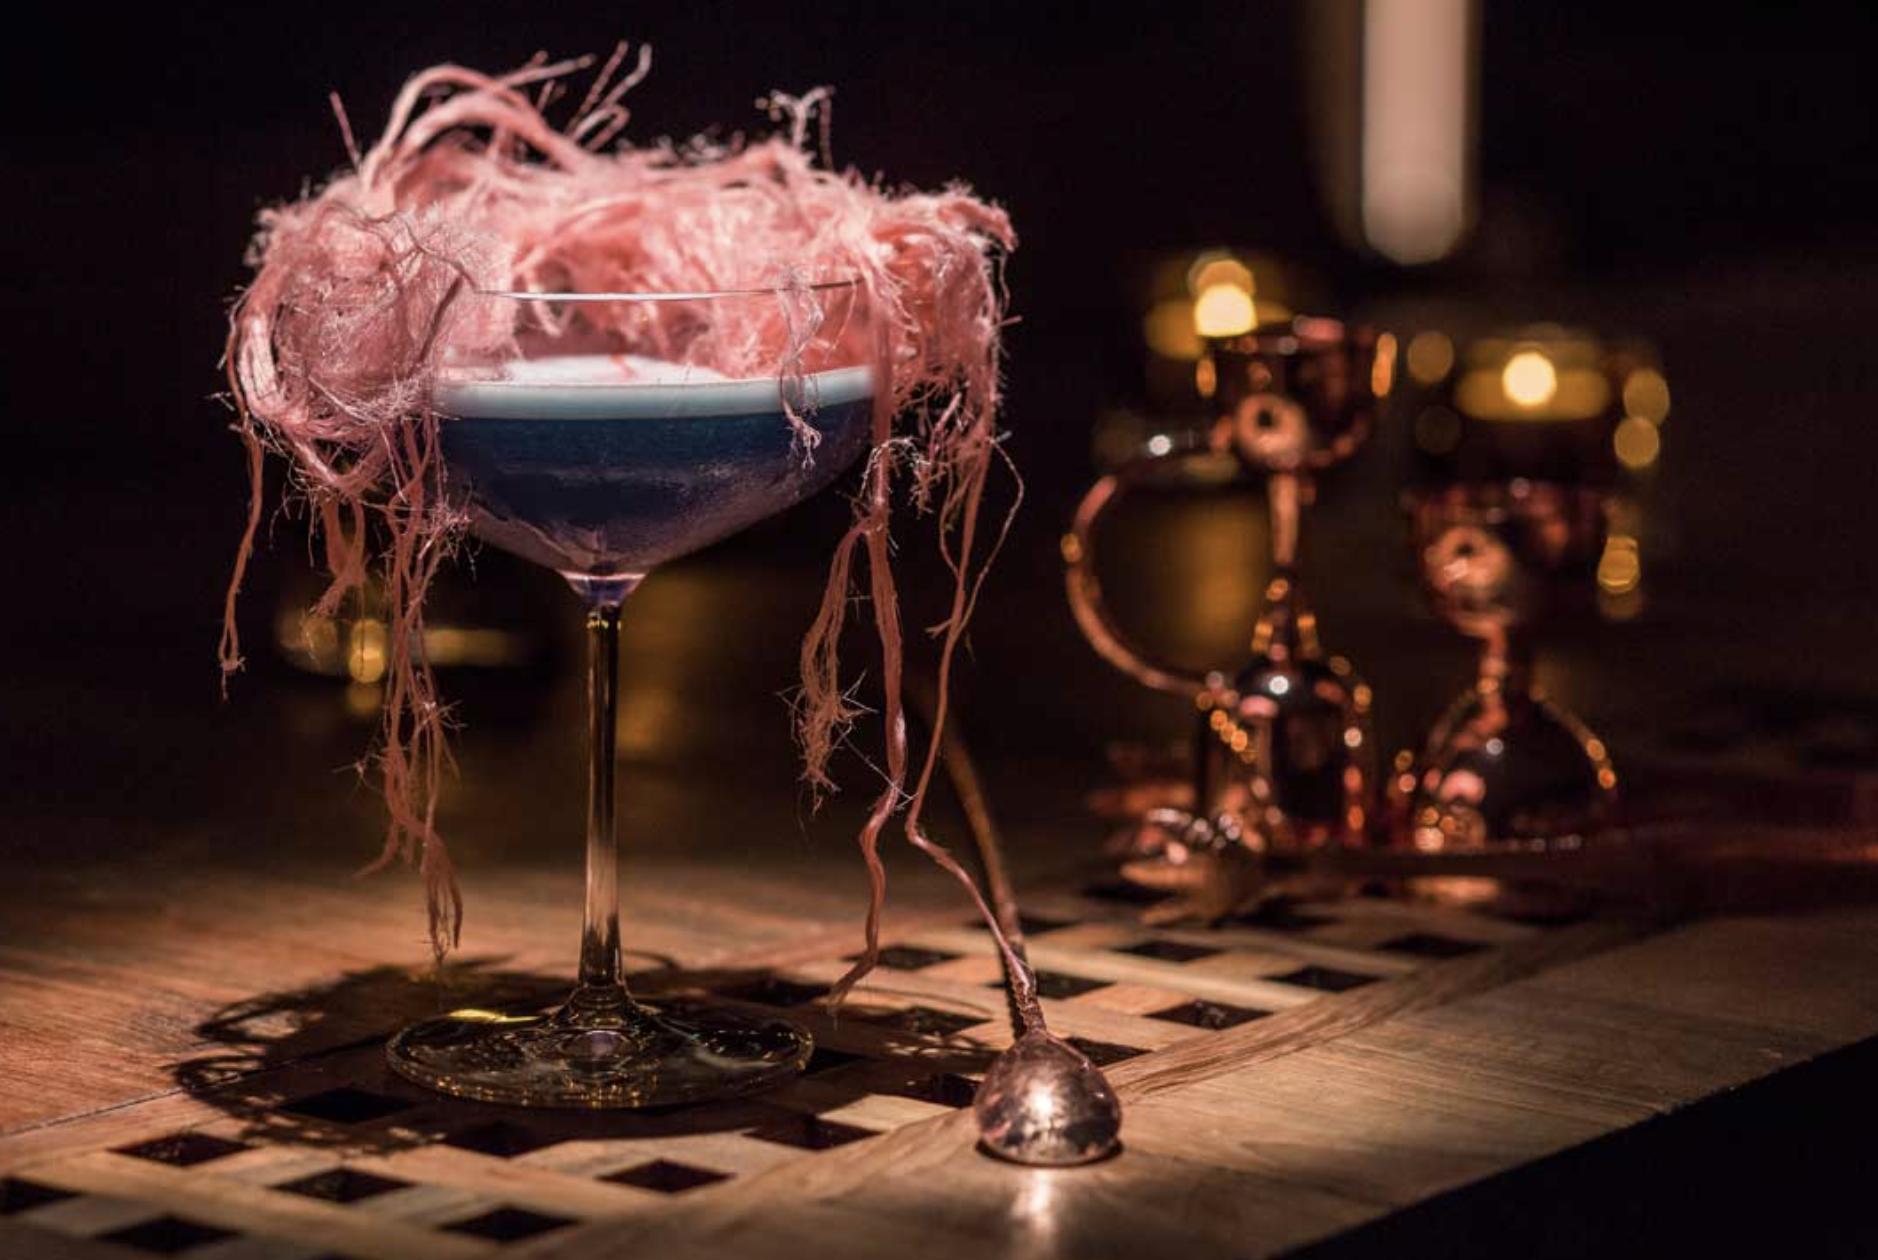 BAR & CLUB_  J.BOROSKI.  #Cocktails #Clubbing #Underground   http://www.diningconcepts.com/restaurants/JBoroski